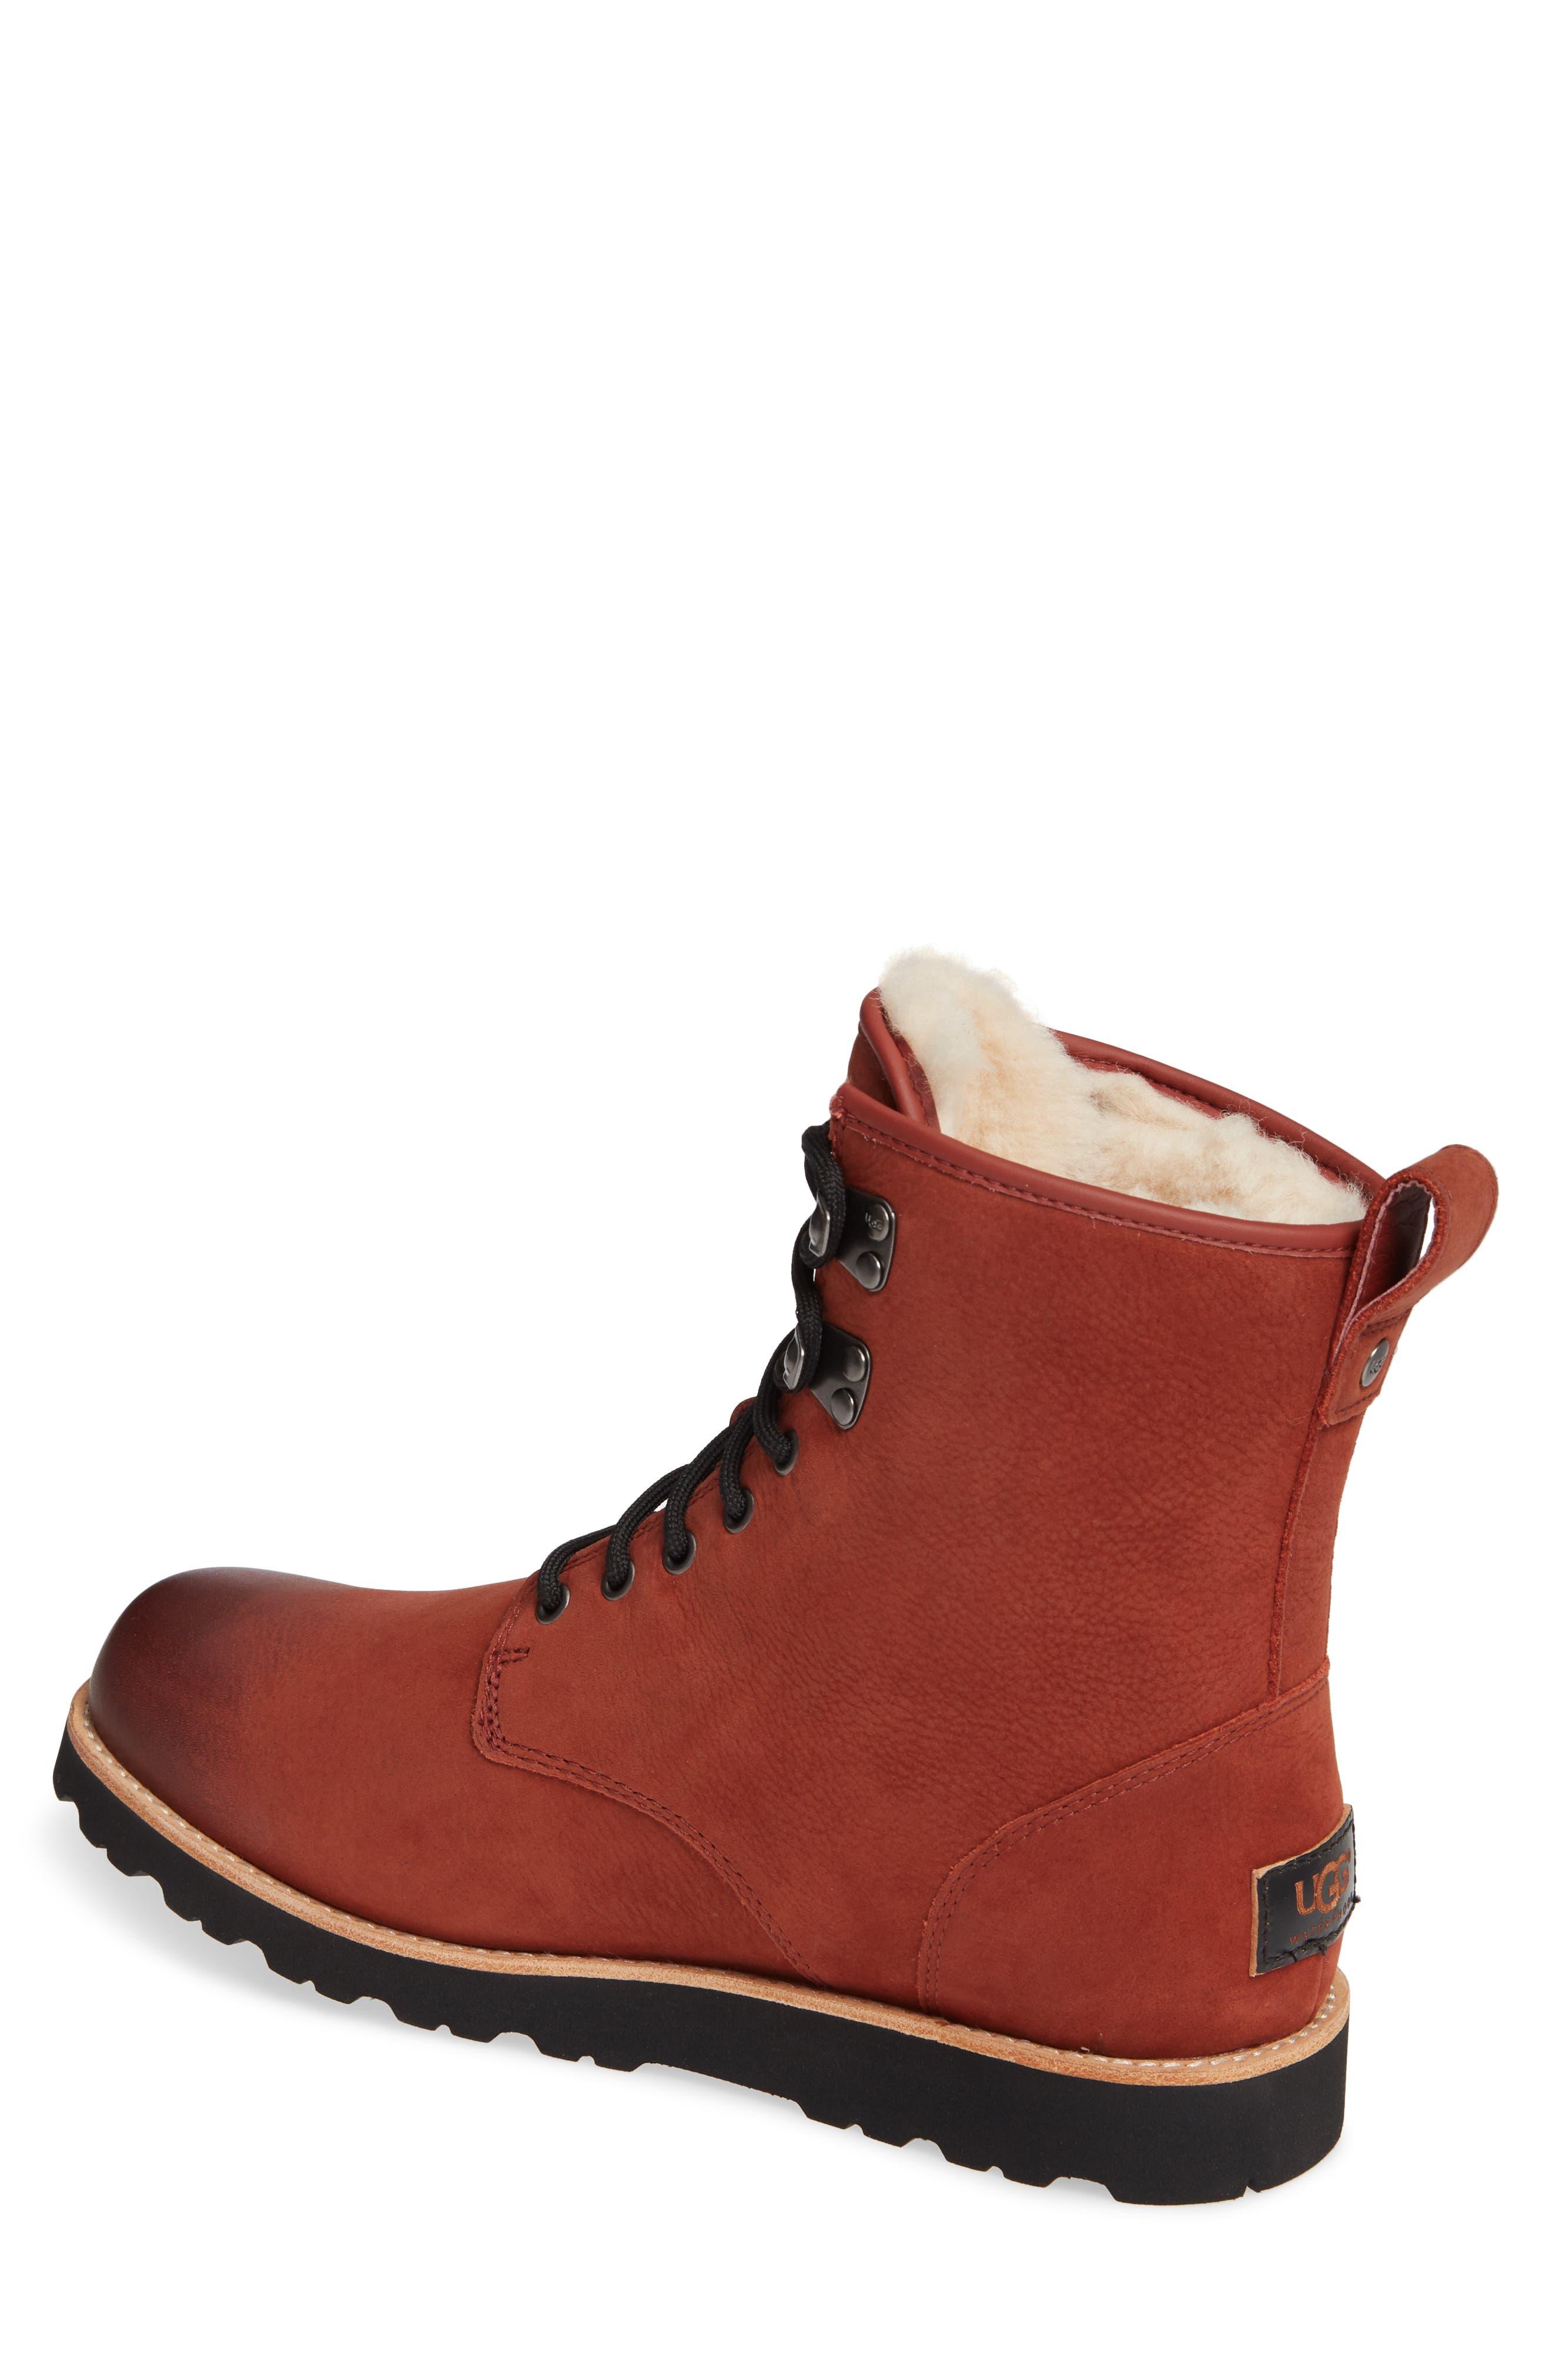 Hannen Waterproof Boot,                             Alternate thumbnail 2, color,                             RED OXIDE